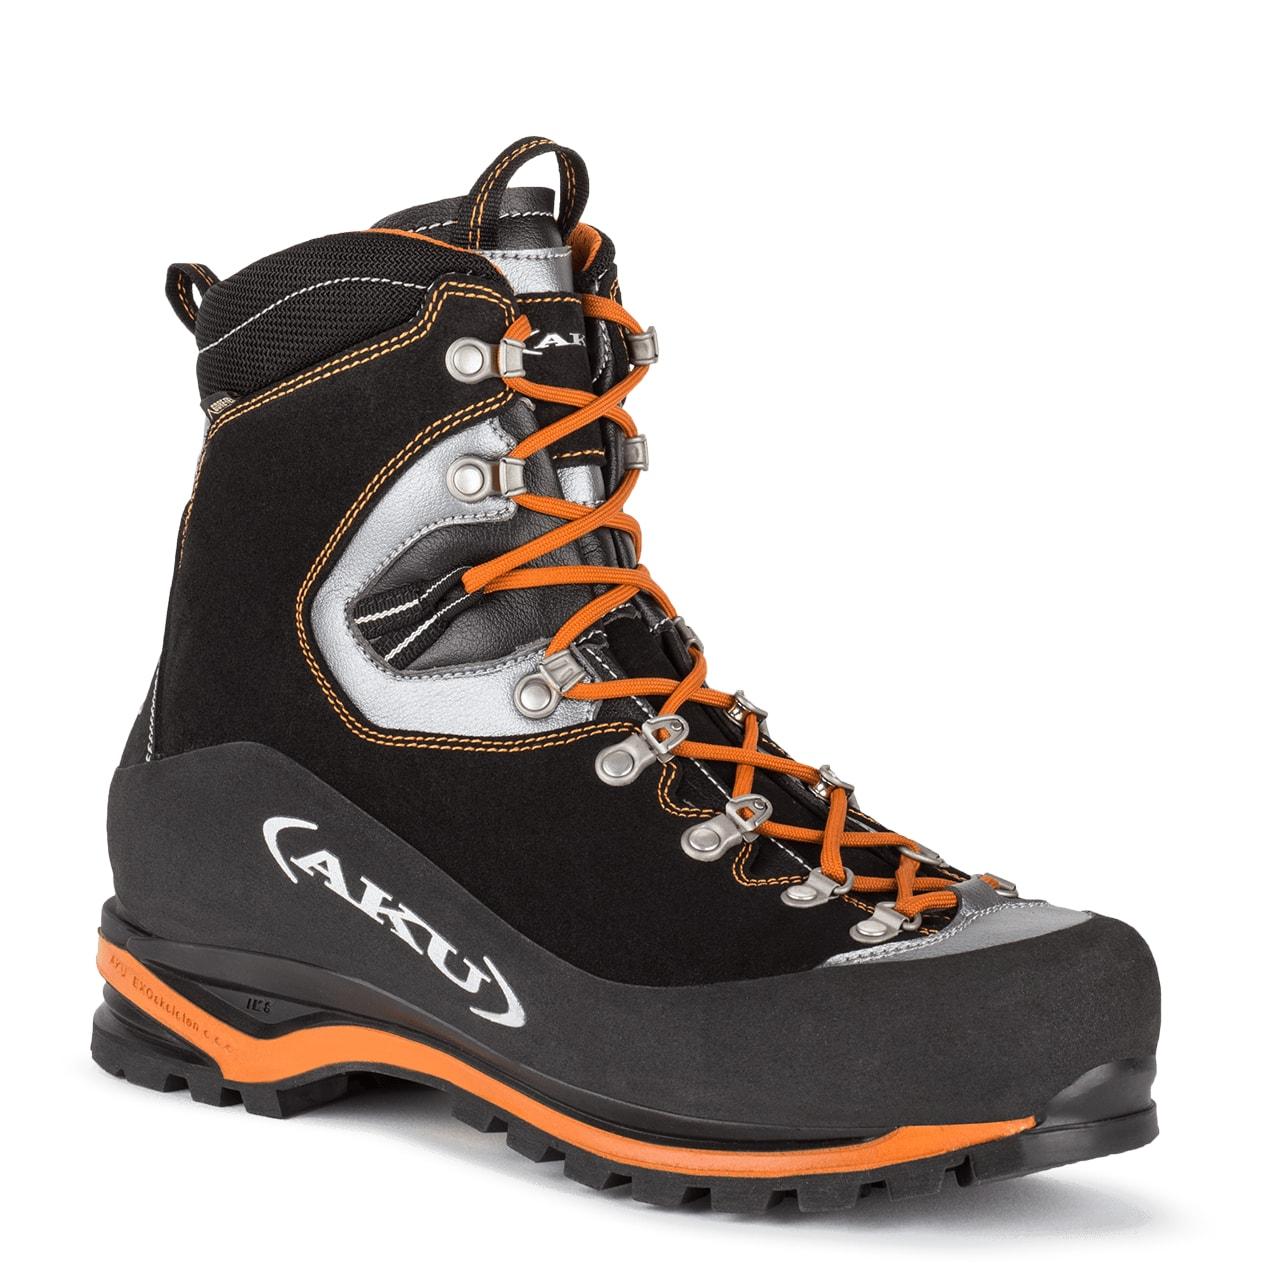 Ботинки мужские AKU Yatumine GTX, black/orange, 39.5